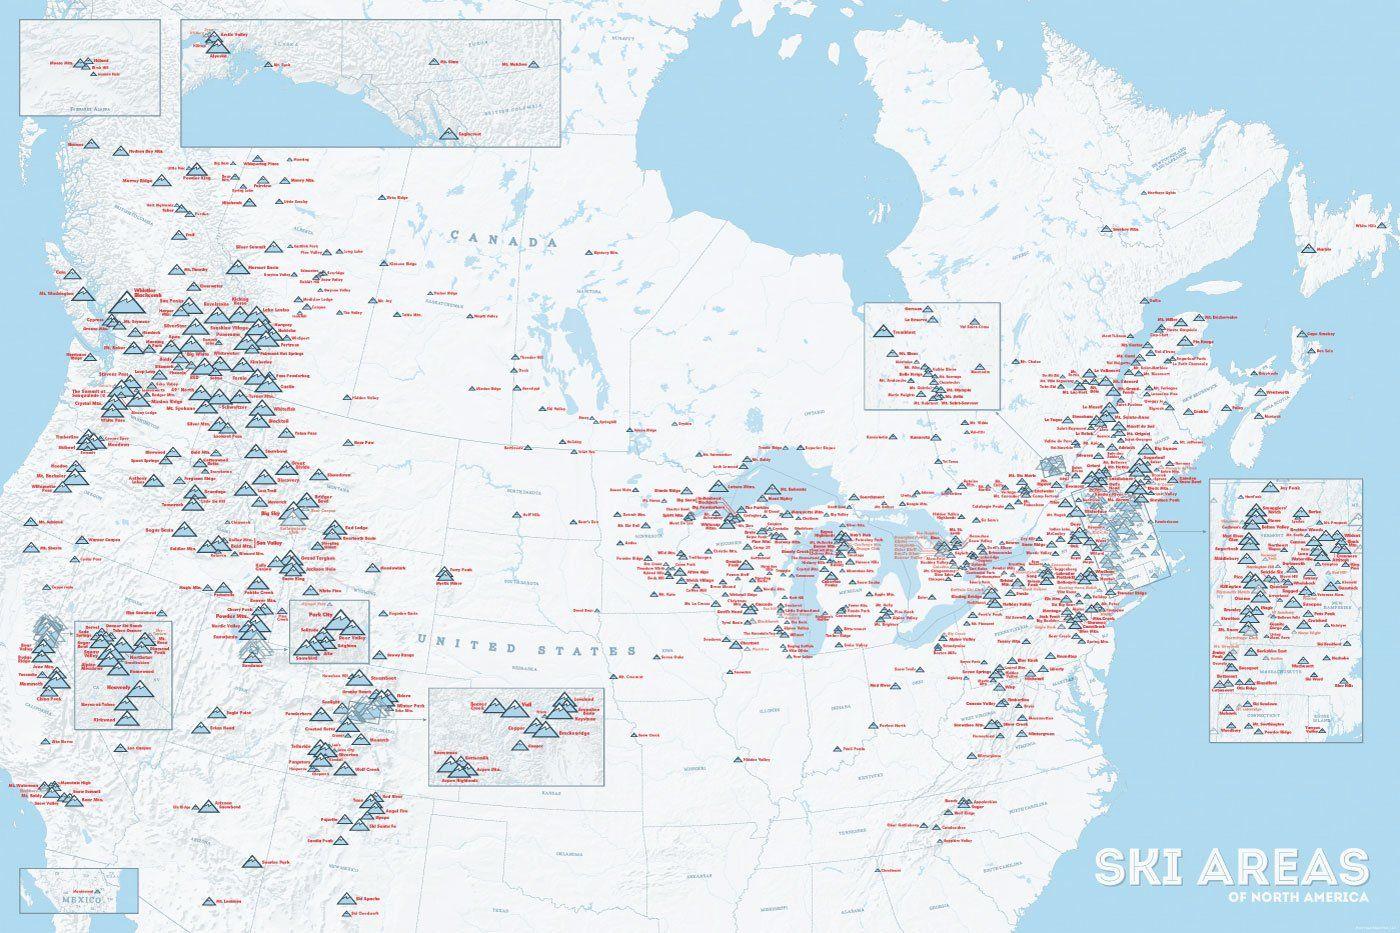 North America Ski Resorts Map 24x36 Poster Ski Resort North